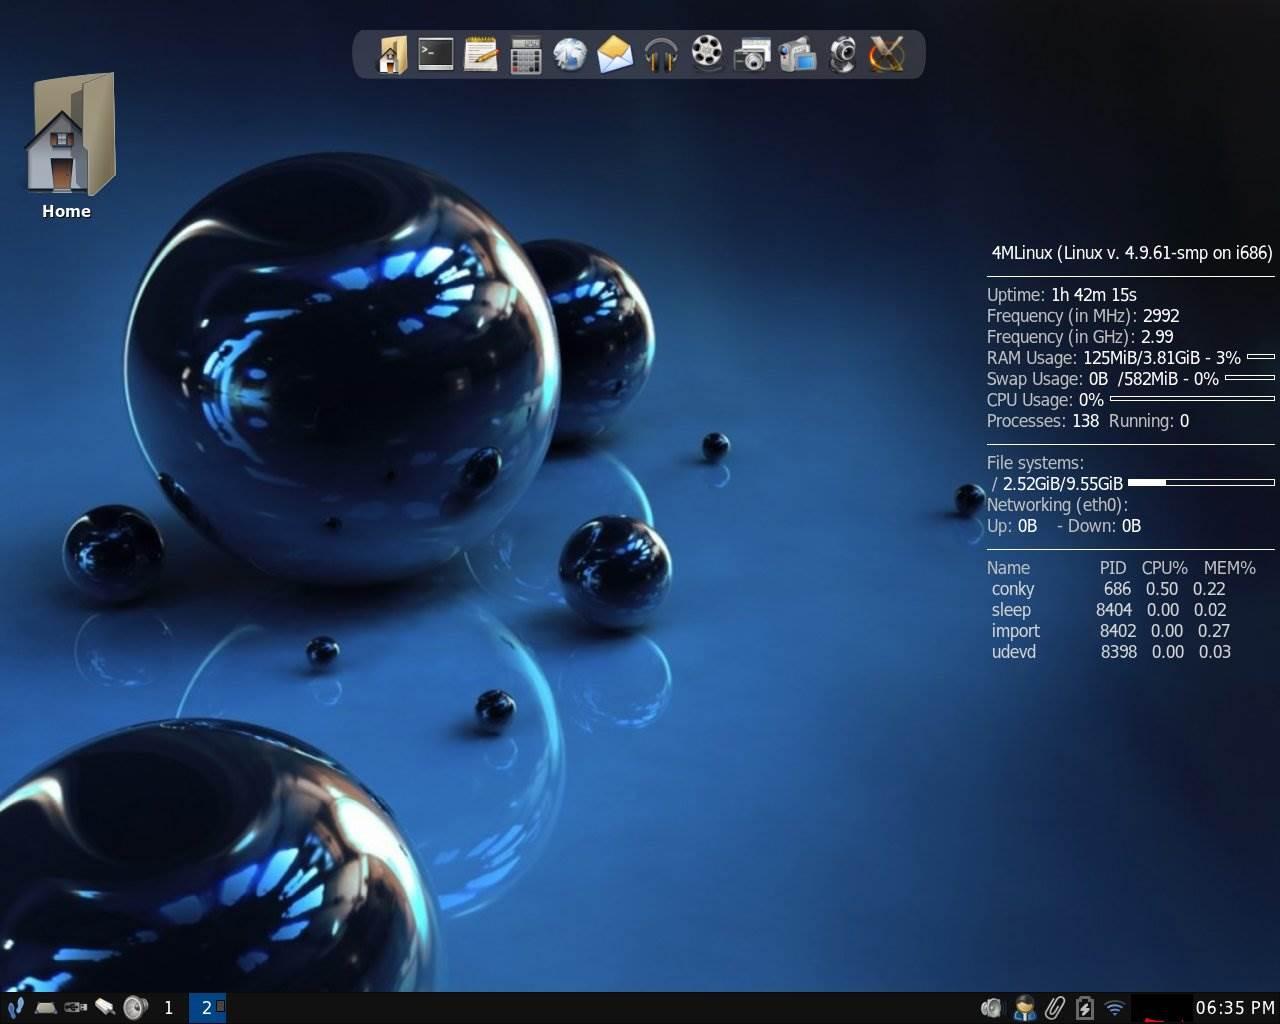 4MLinux